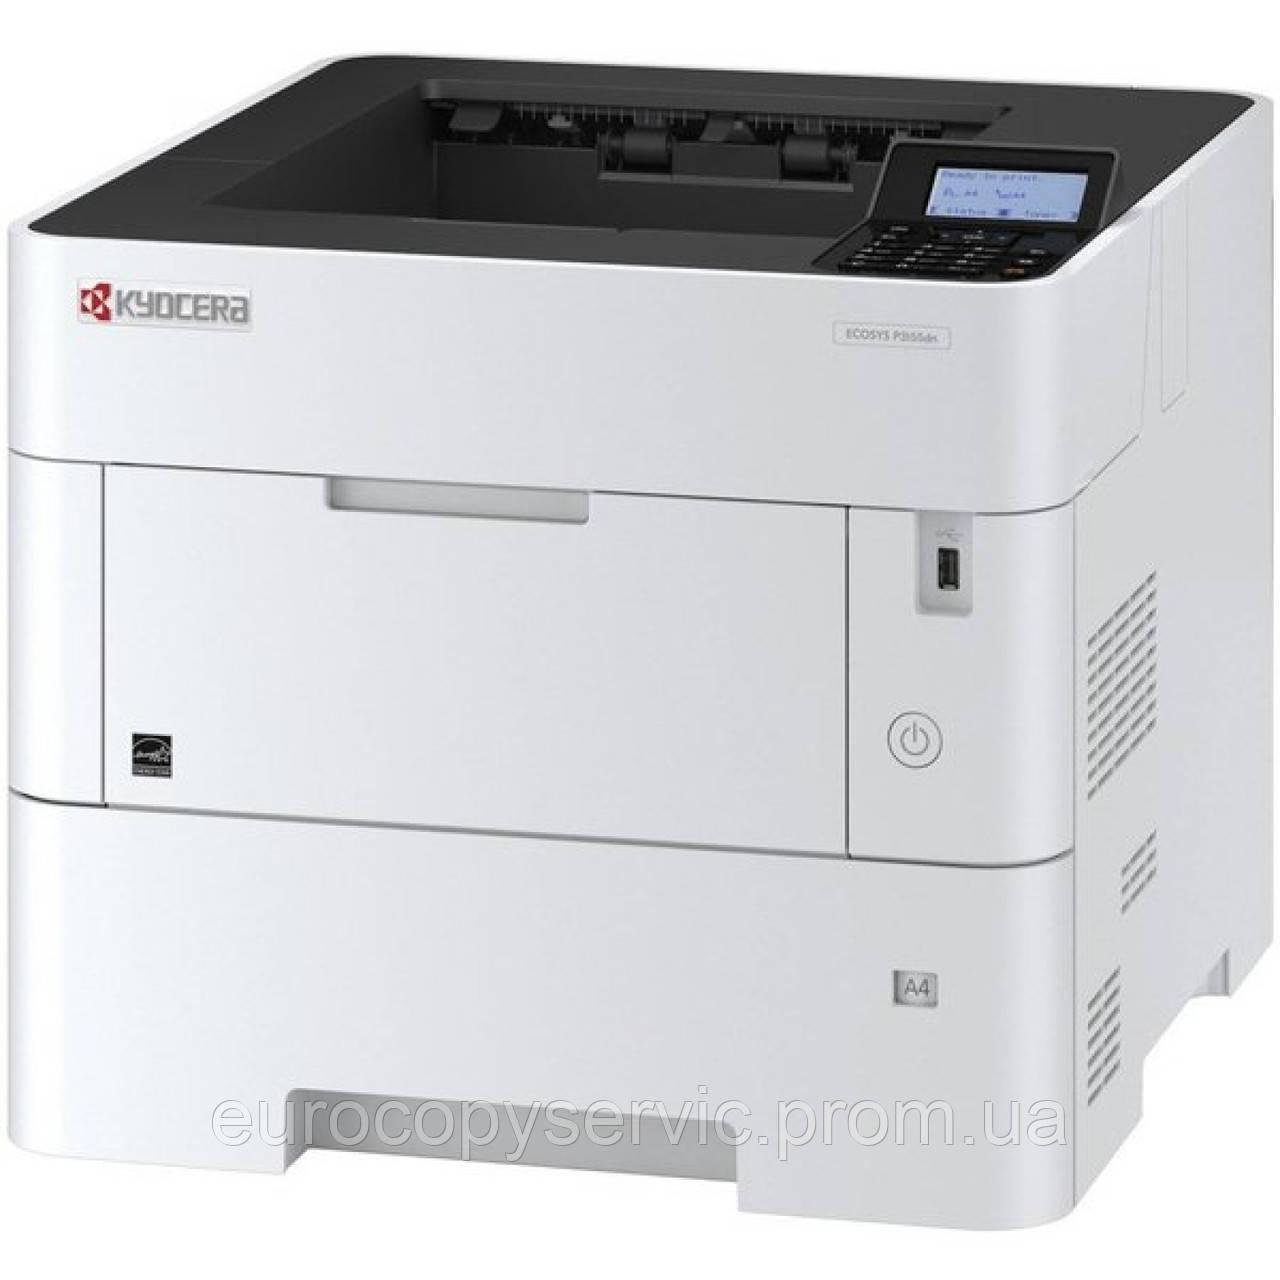 Принтер Kyocera А4 моно ECOSYS P3155dn (1102TR3NL0)